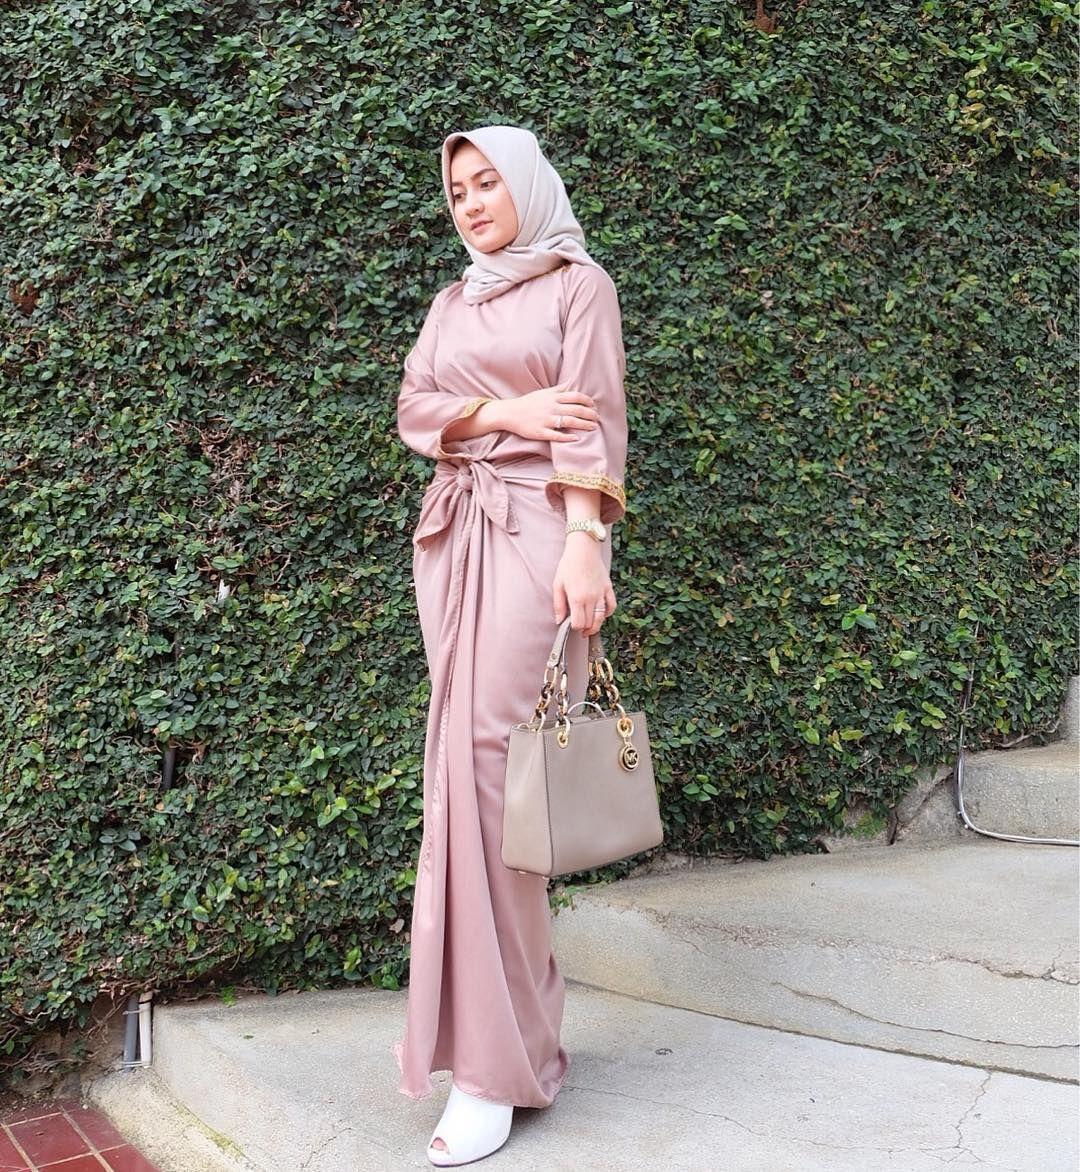 Pin By Asiah On Muslimah Fashion Hijab Styleniqab In 2018 Chocker Slice Top Blouse Baju Atasan Wanita Bl899 Style Abaya Modest